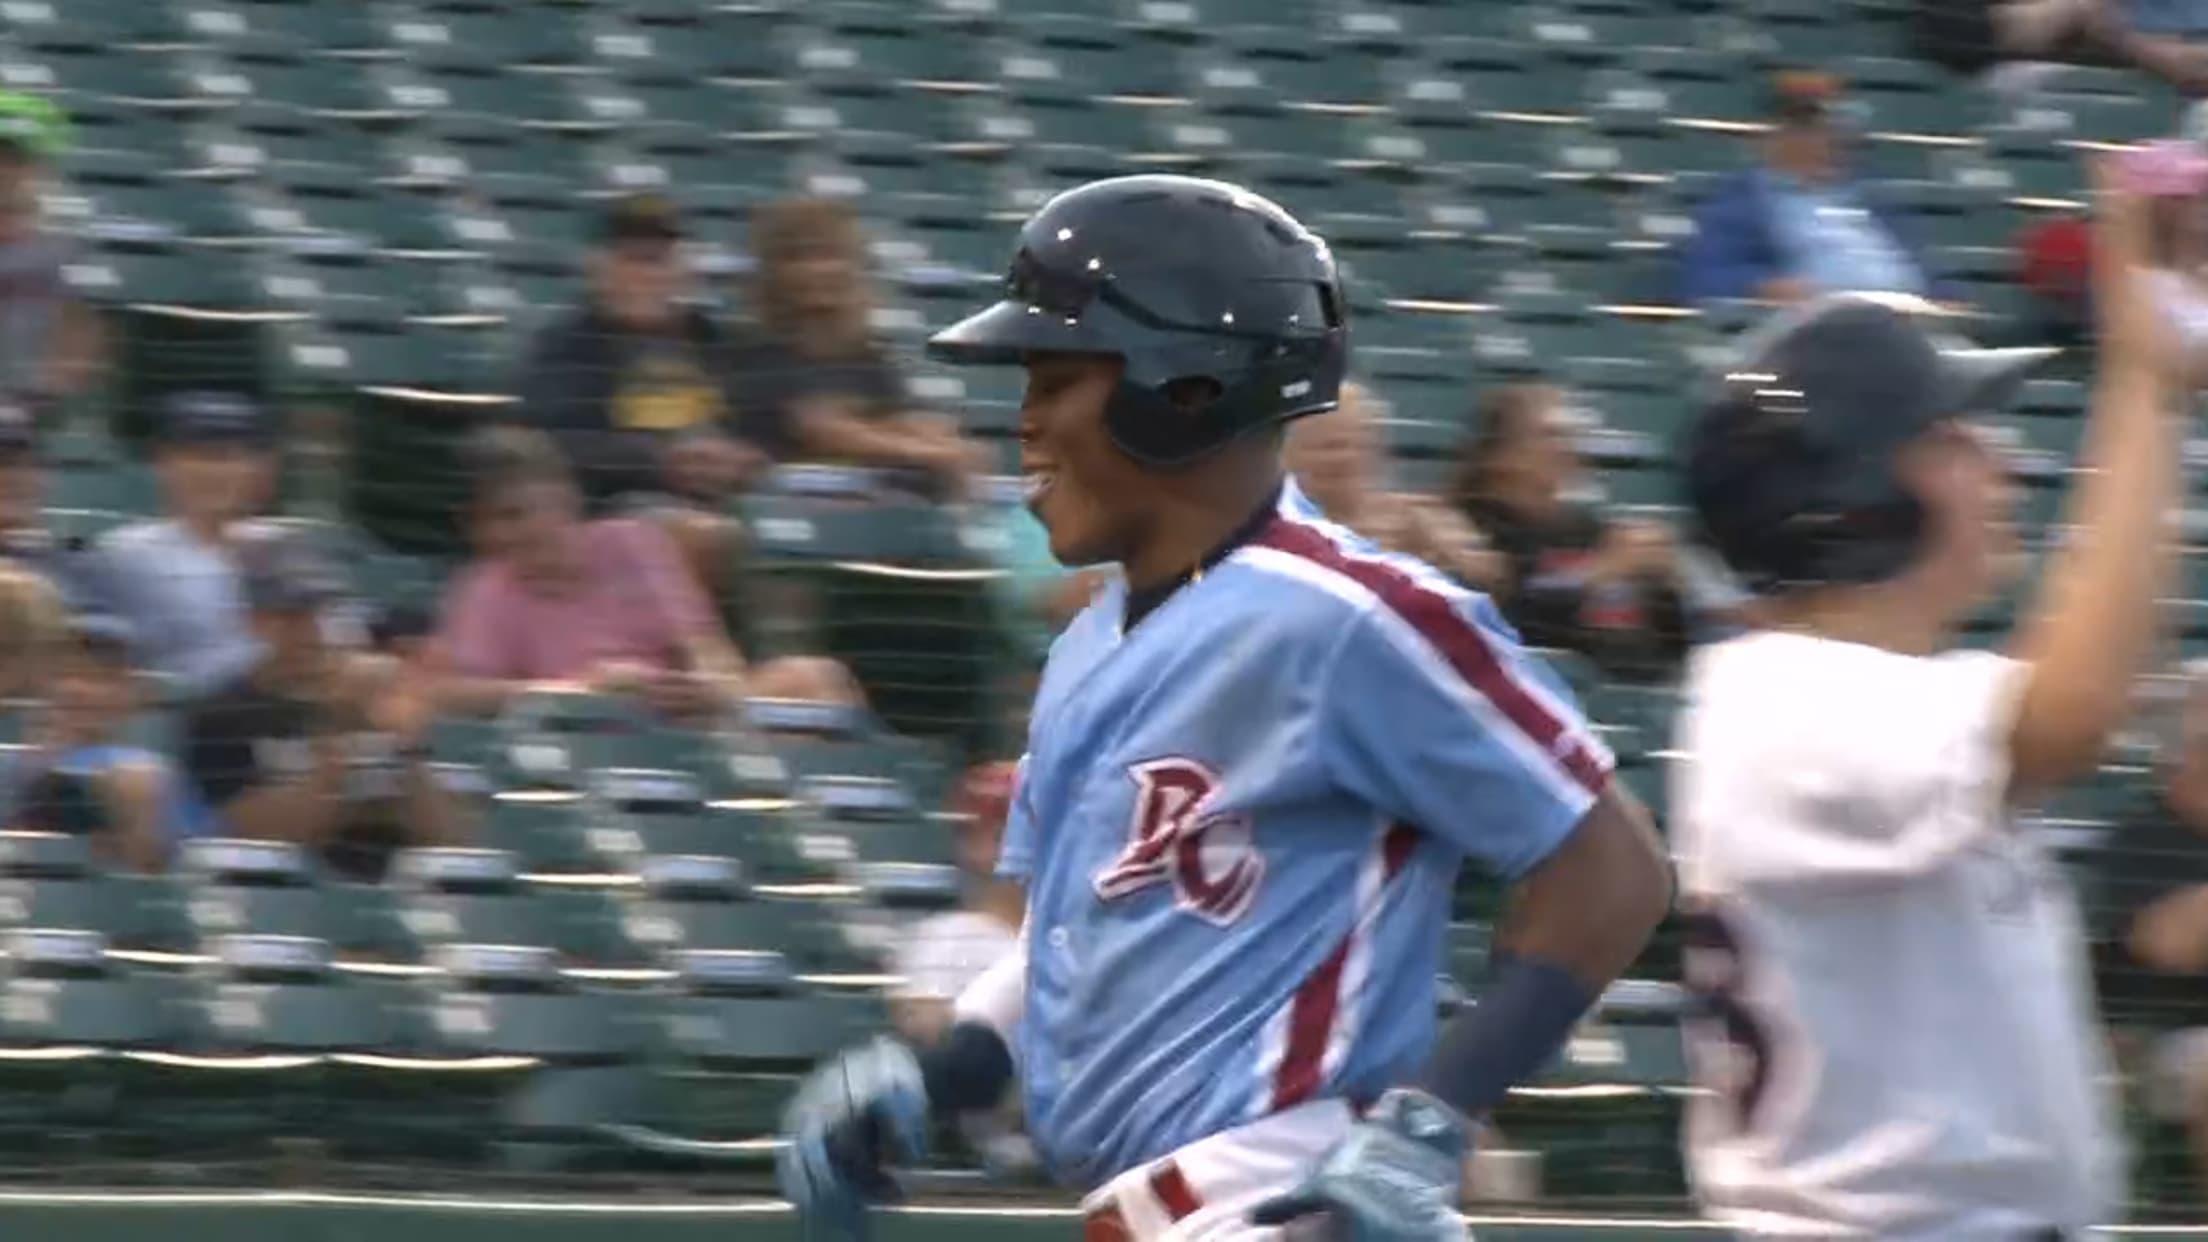 Top Prospects: Garcia, PHI